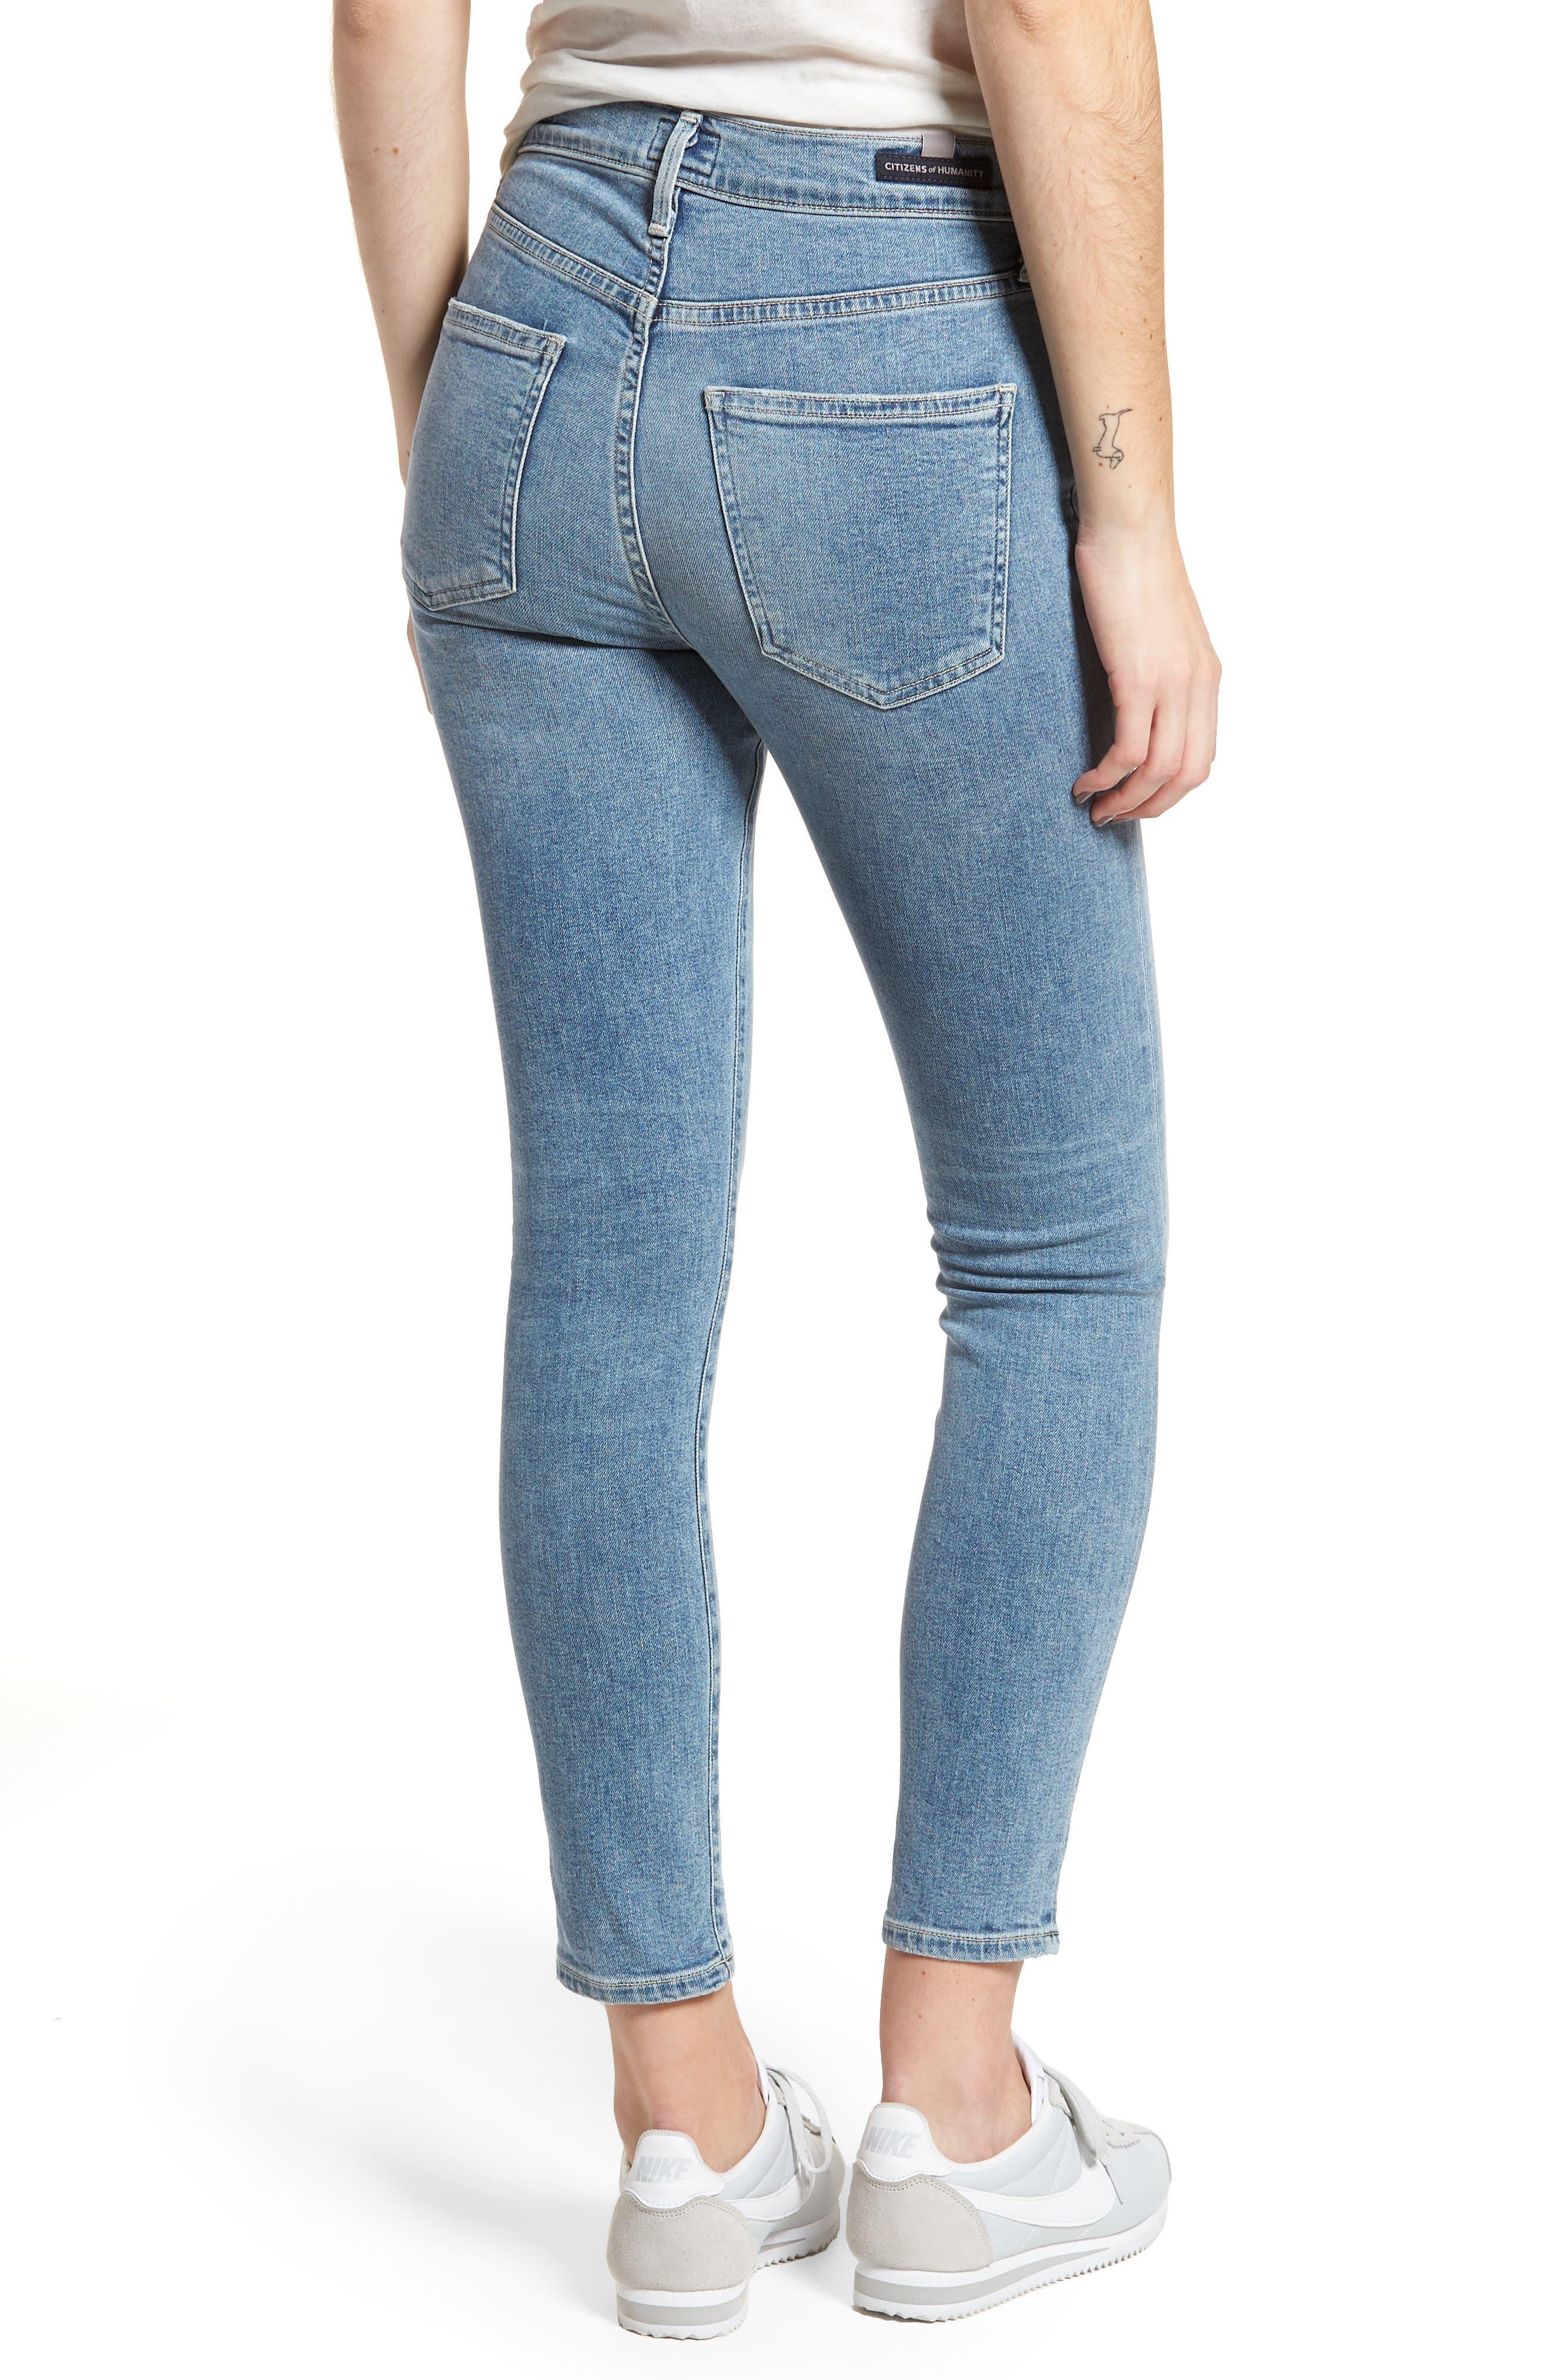 Rocket High Waist Crop Skinny Jeans,                             Alternate thumbnail 2, color,                             457